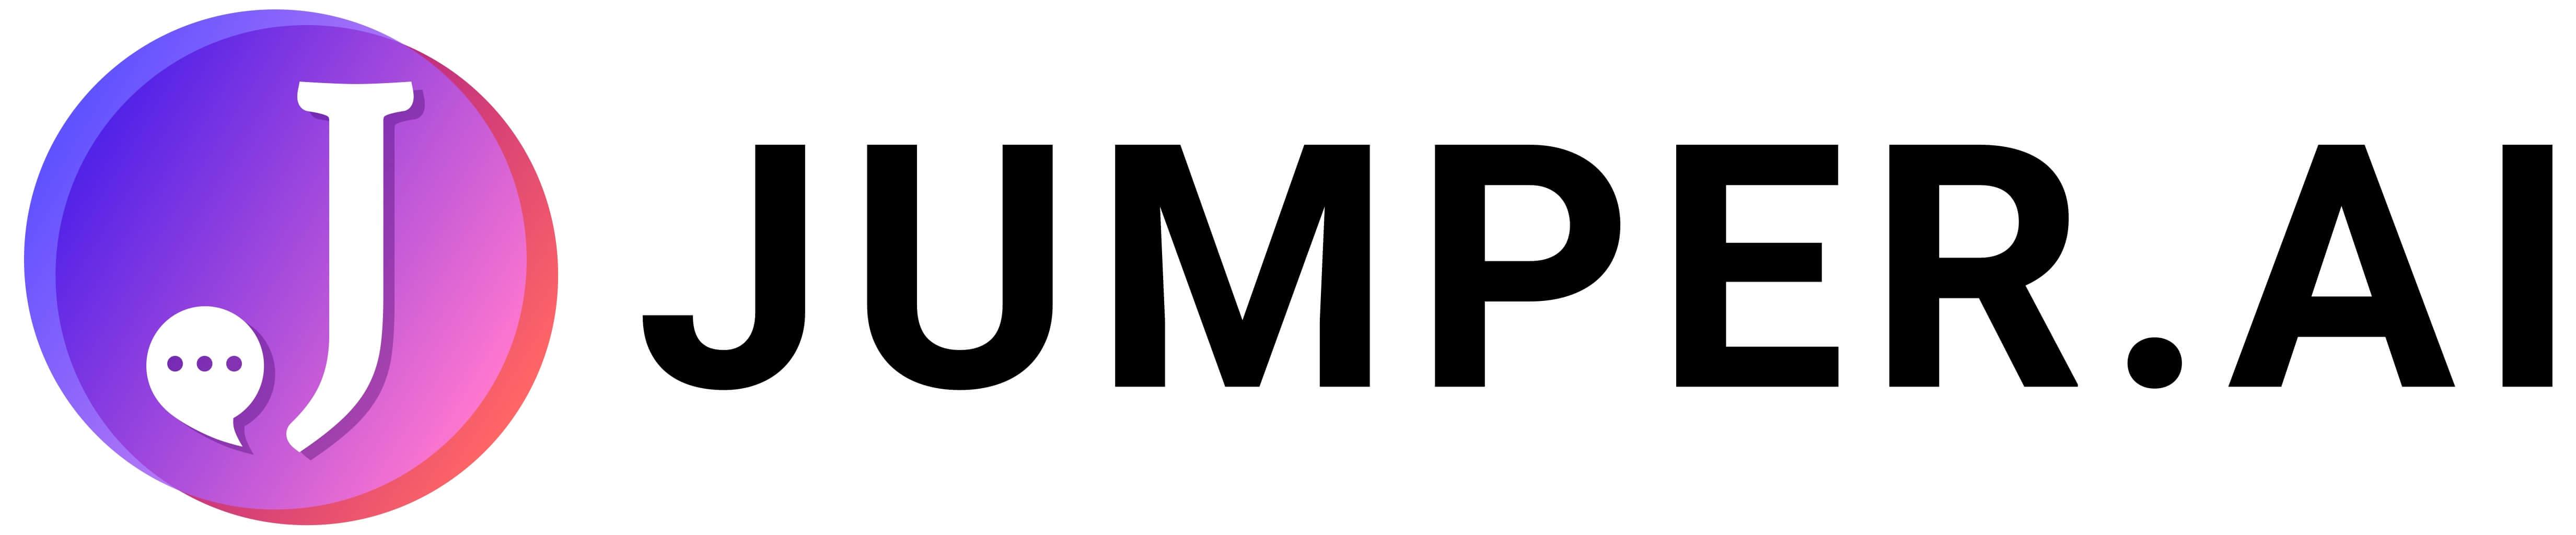 The speaker works for Jumper.ai